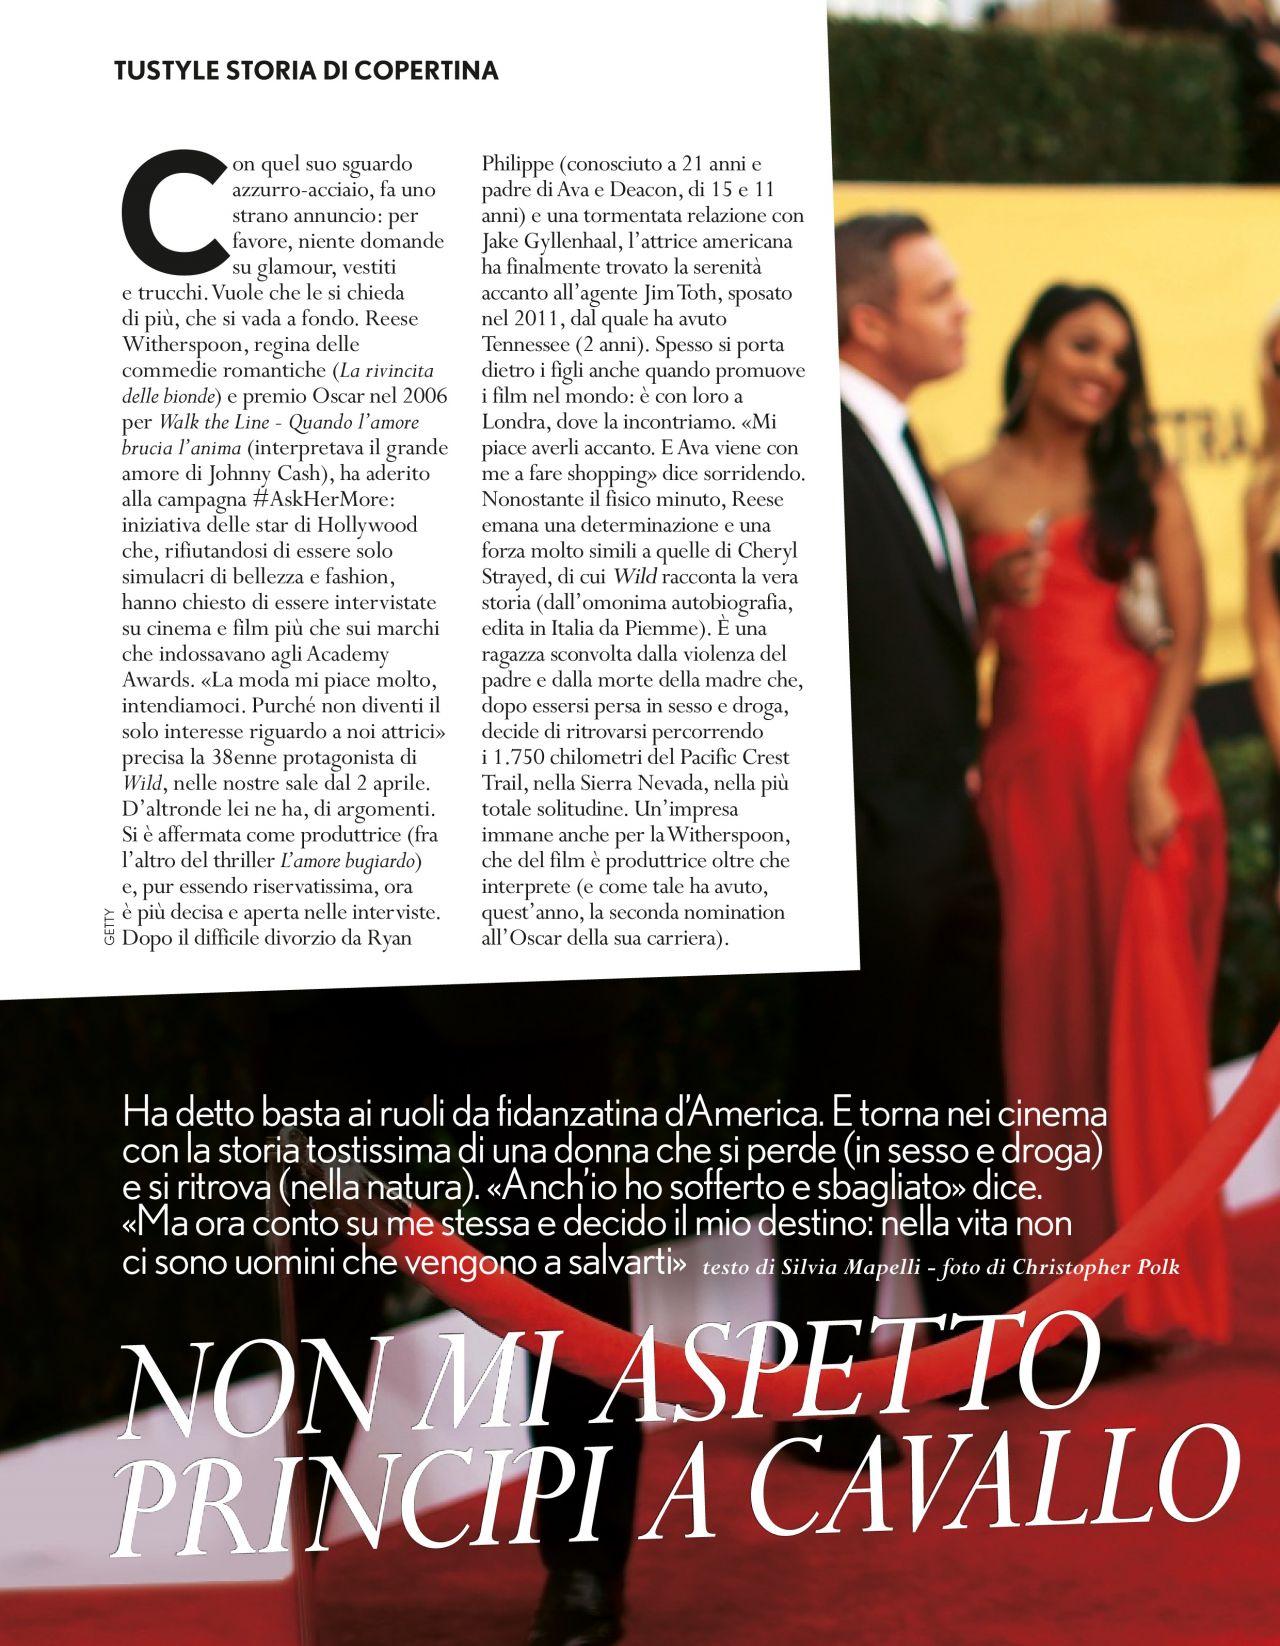 Tustyle Magazine November 2015 Issue: TuStyle Magazine March 2015 Issue